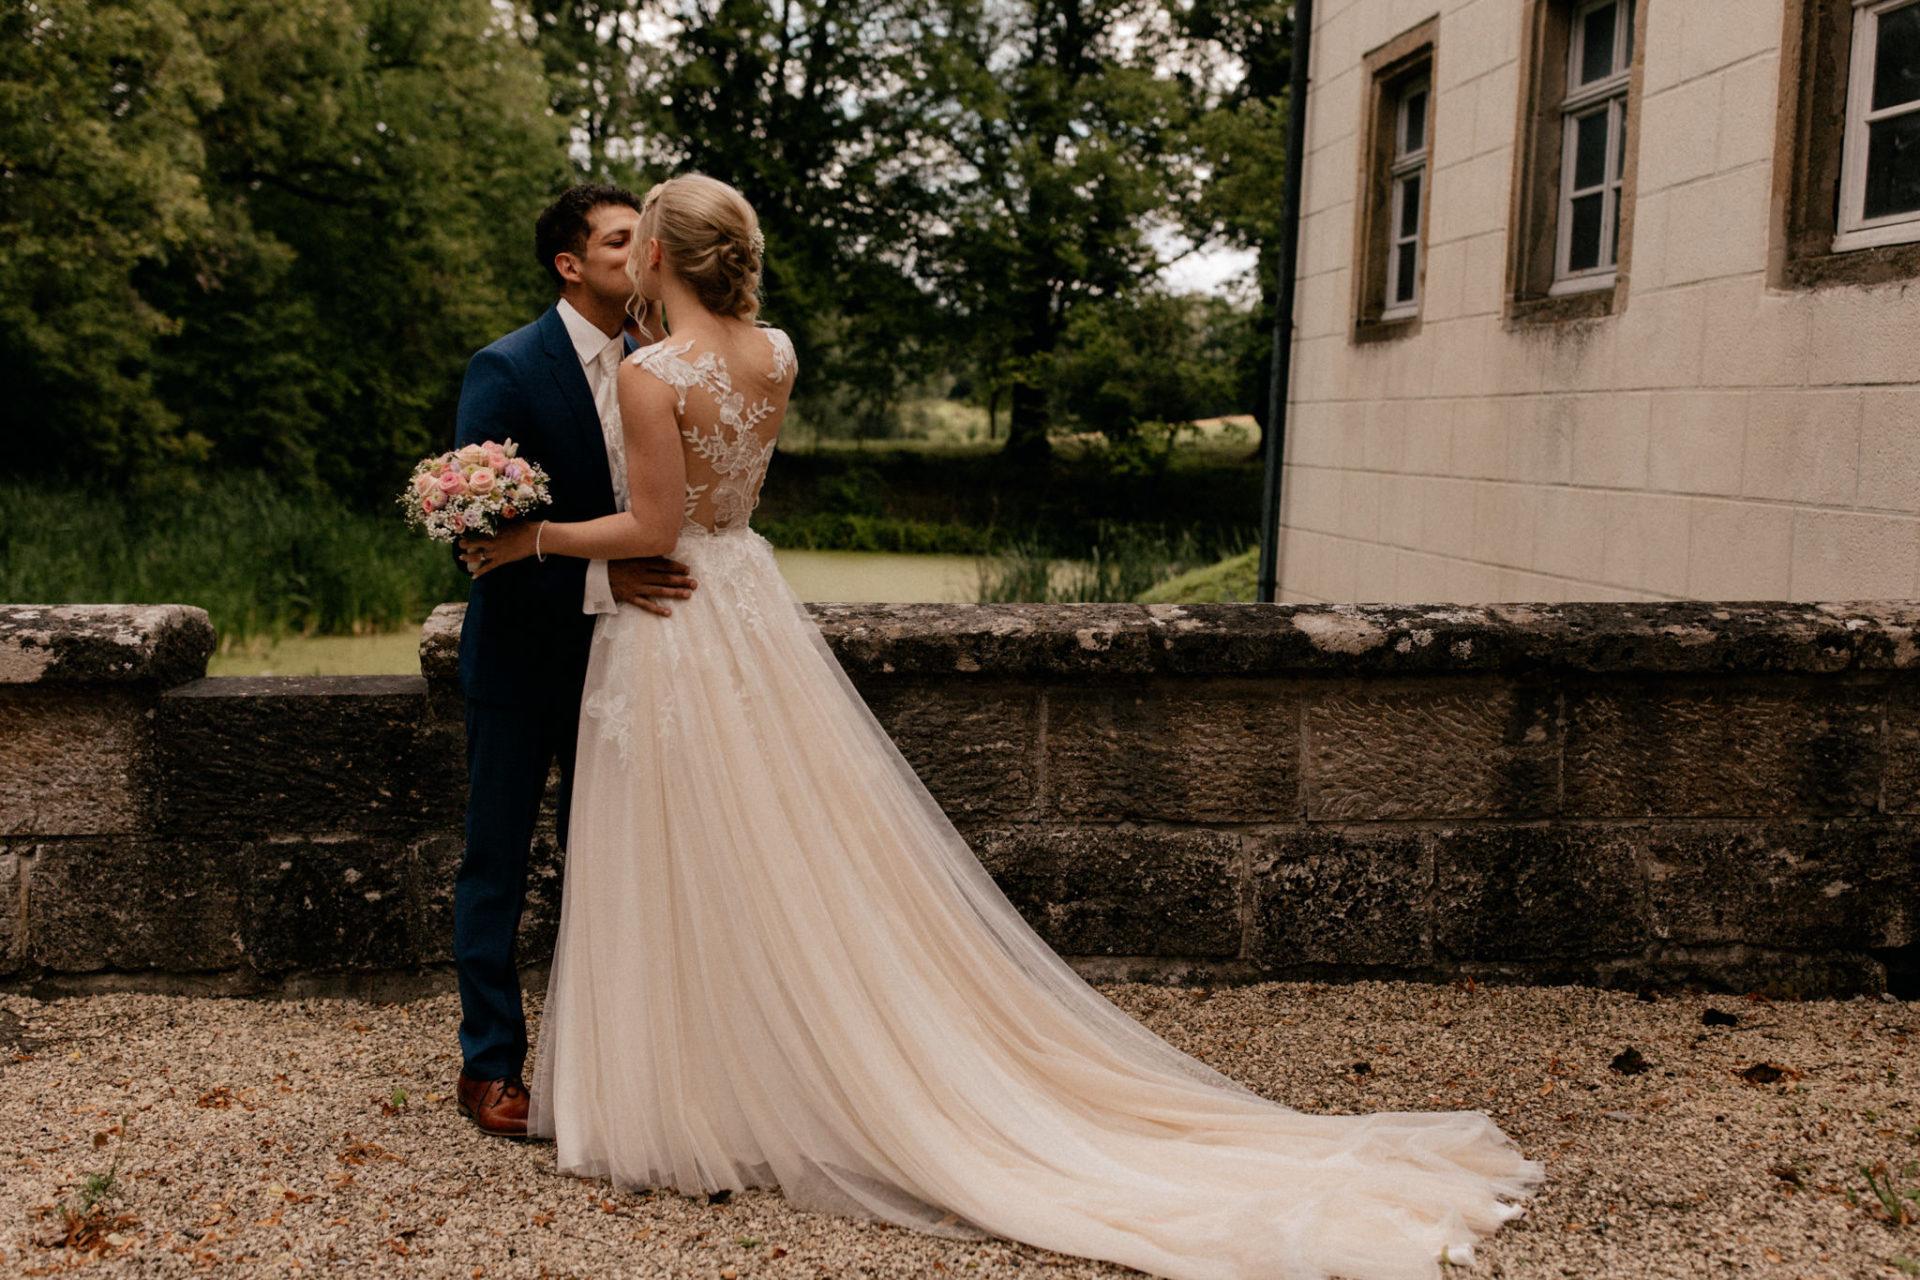 wedding photographer suttgart-reception water castle Erkenbrechtshausen Crailsheim-first look bride and groom